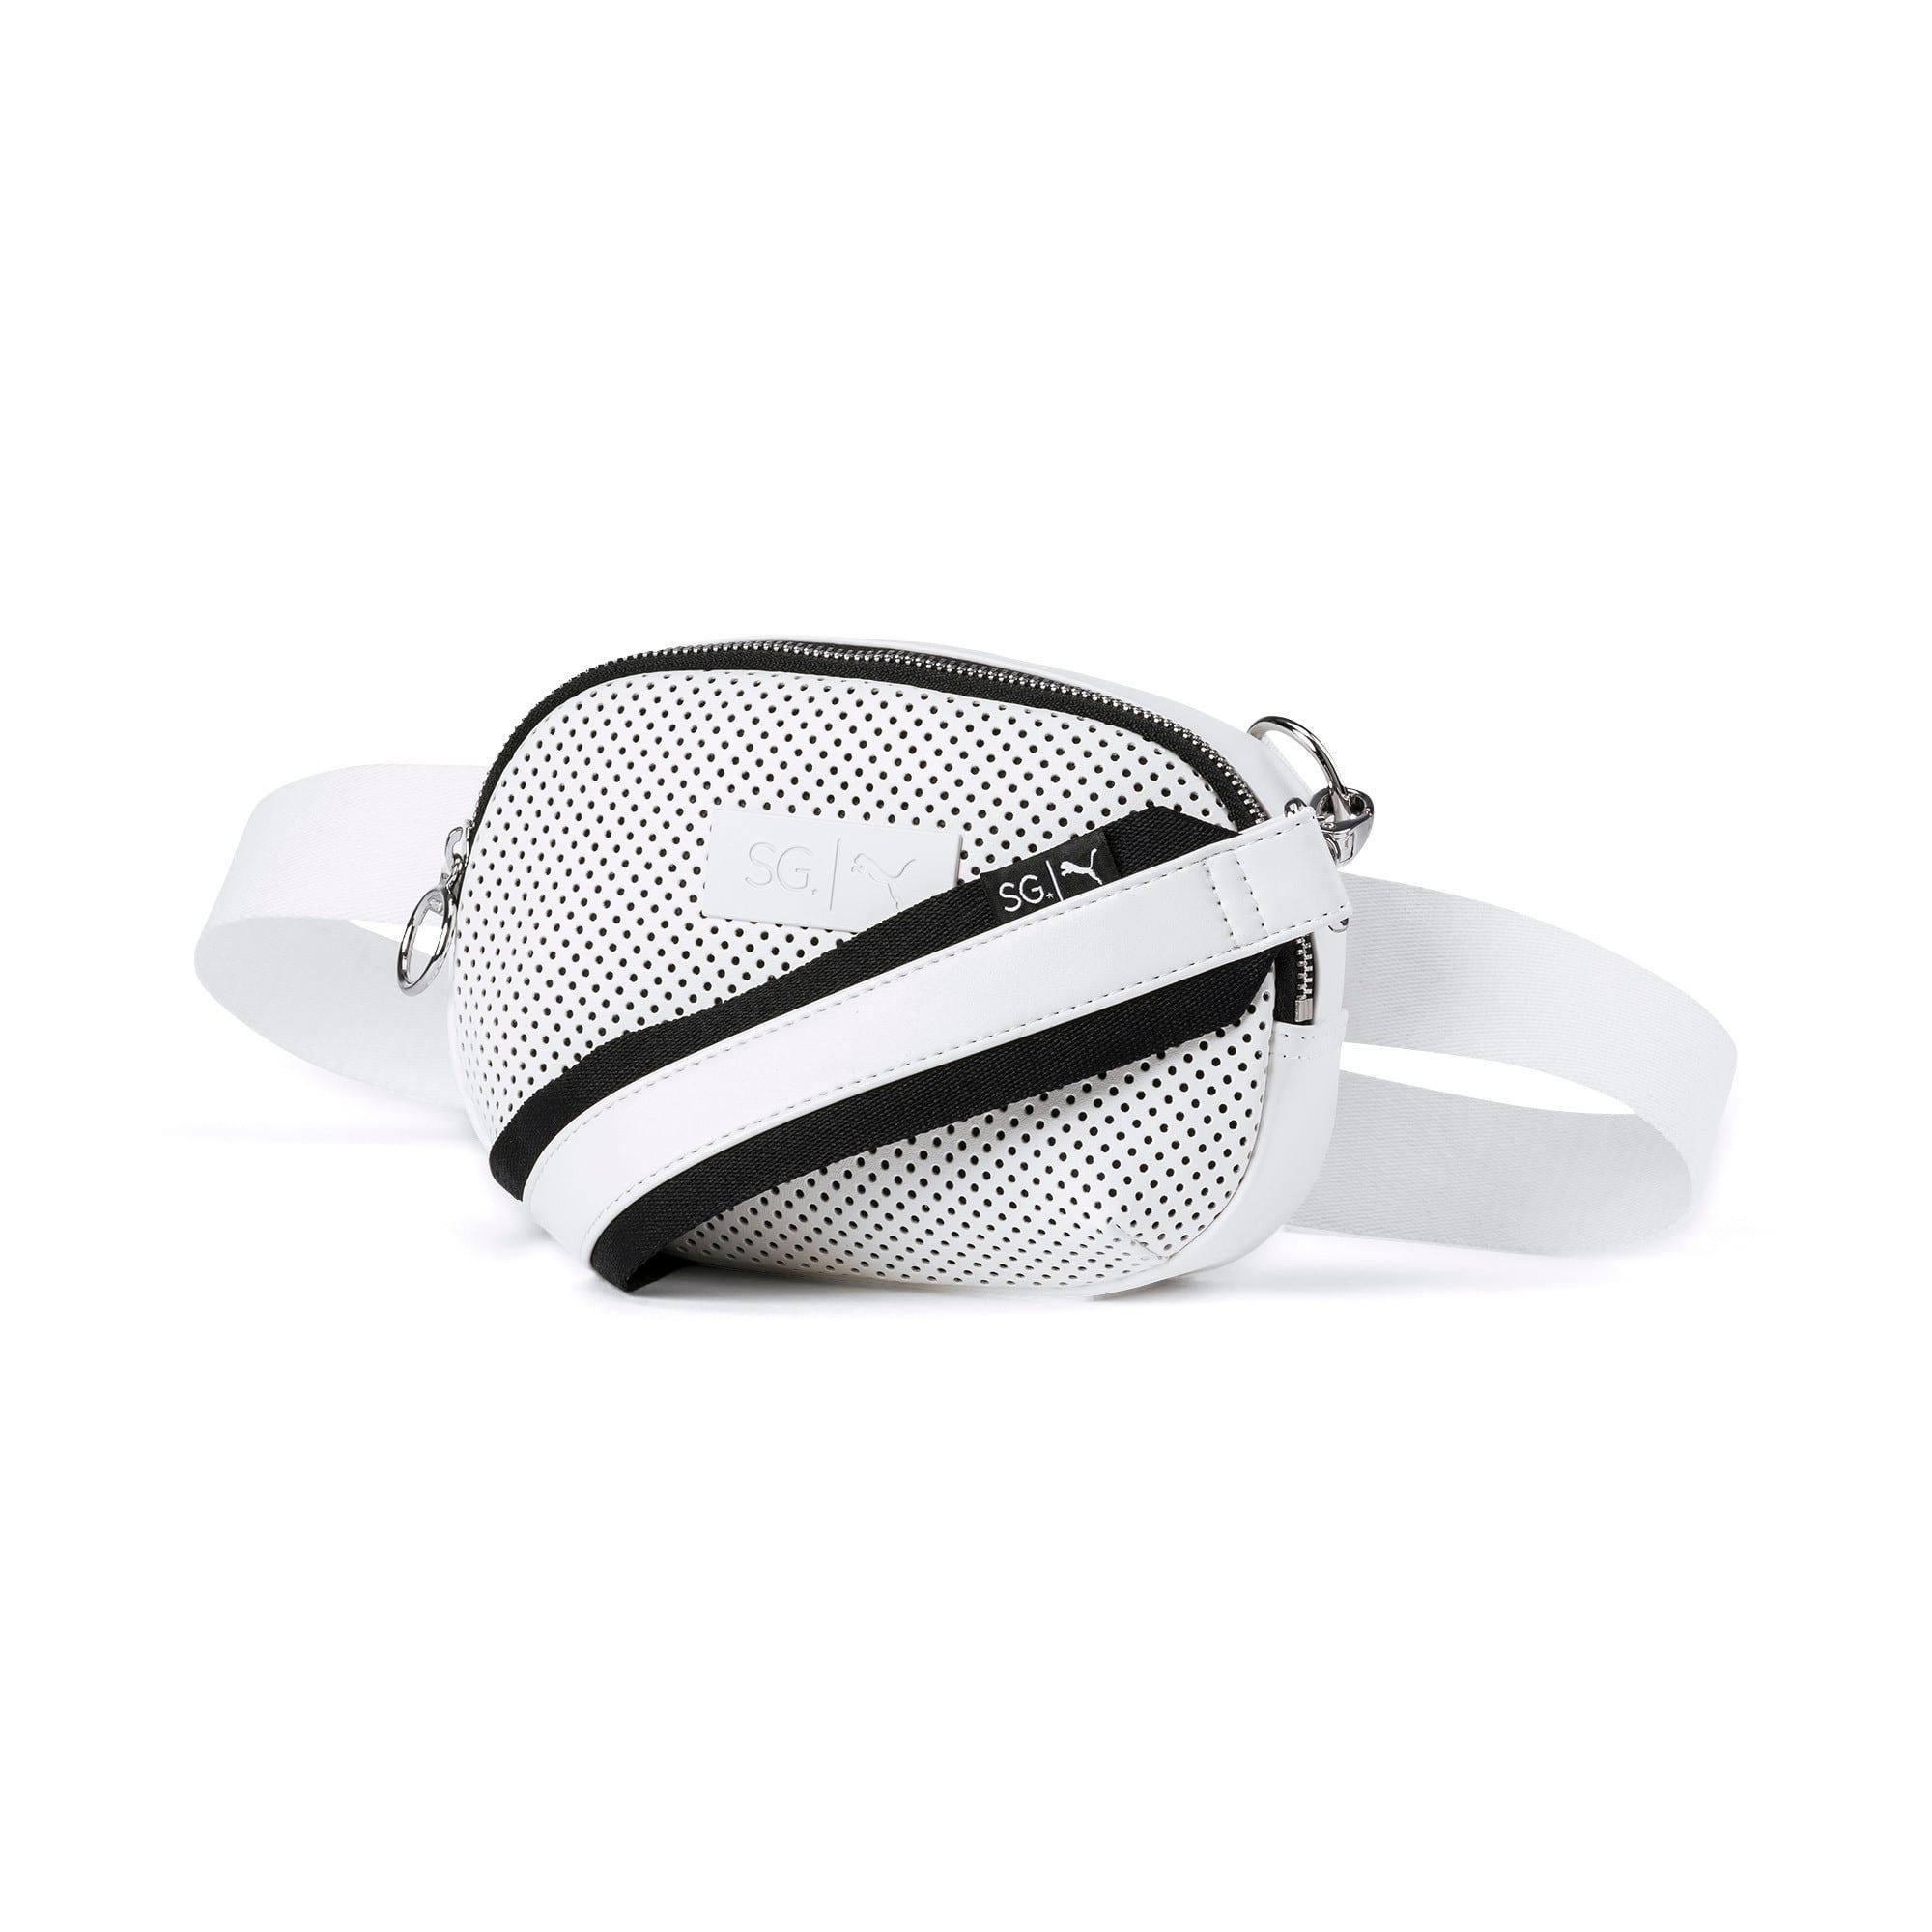 Thumbnail 1 of SG x PUMA Style Crossbody Bag, Puma White, medium